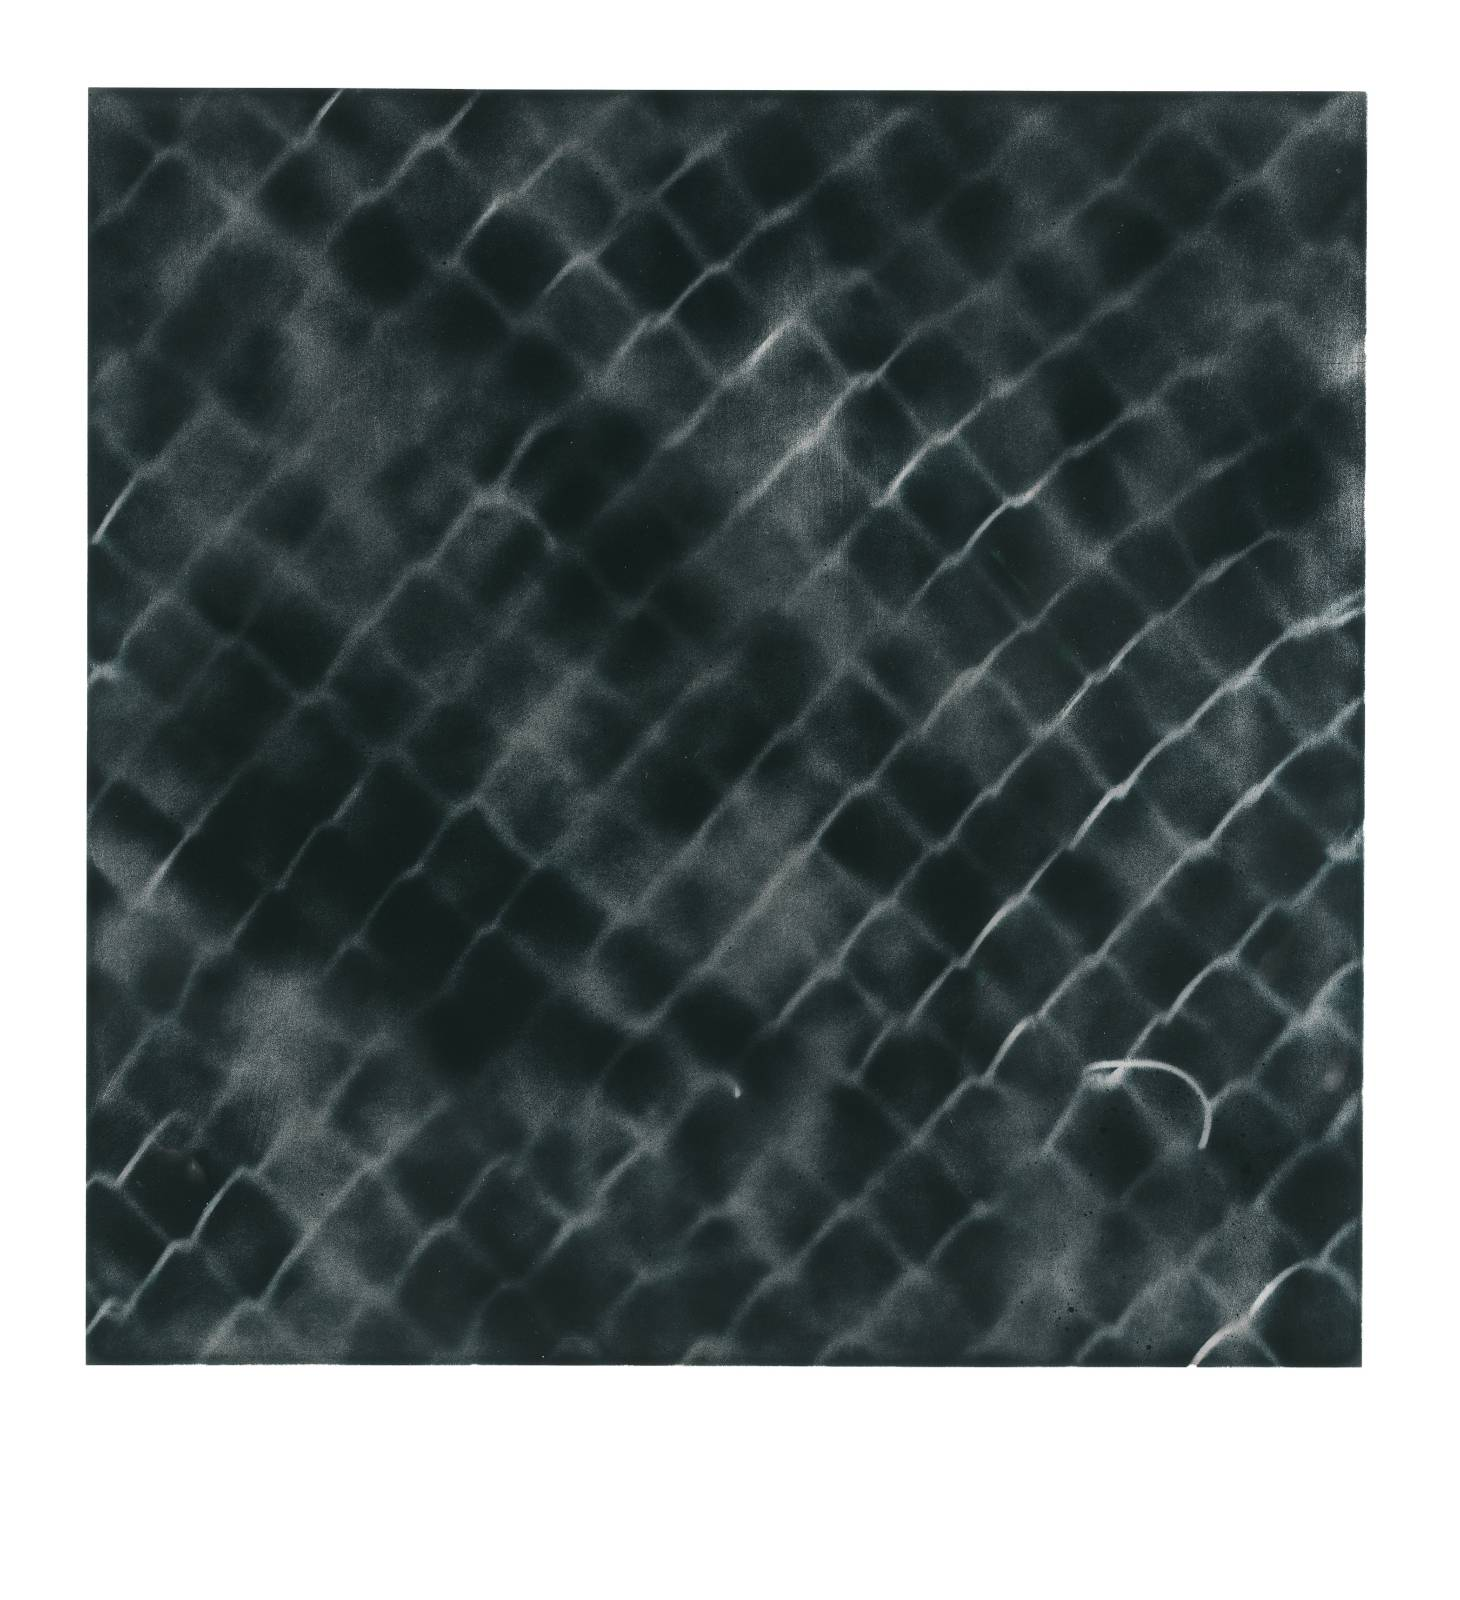 "STAIN : 40°42'52.1""N 73°56'05.0""W, 2015, spraypaint on aluminium, 81,3 x 81,3 cm"